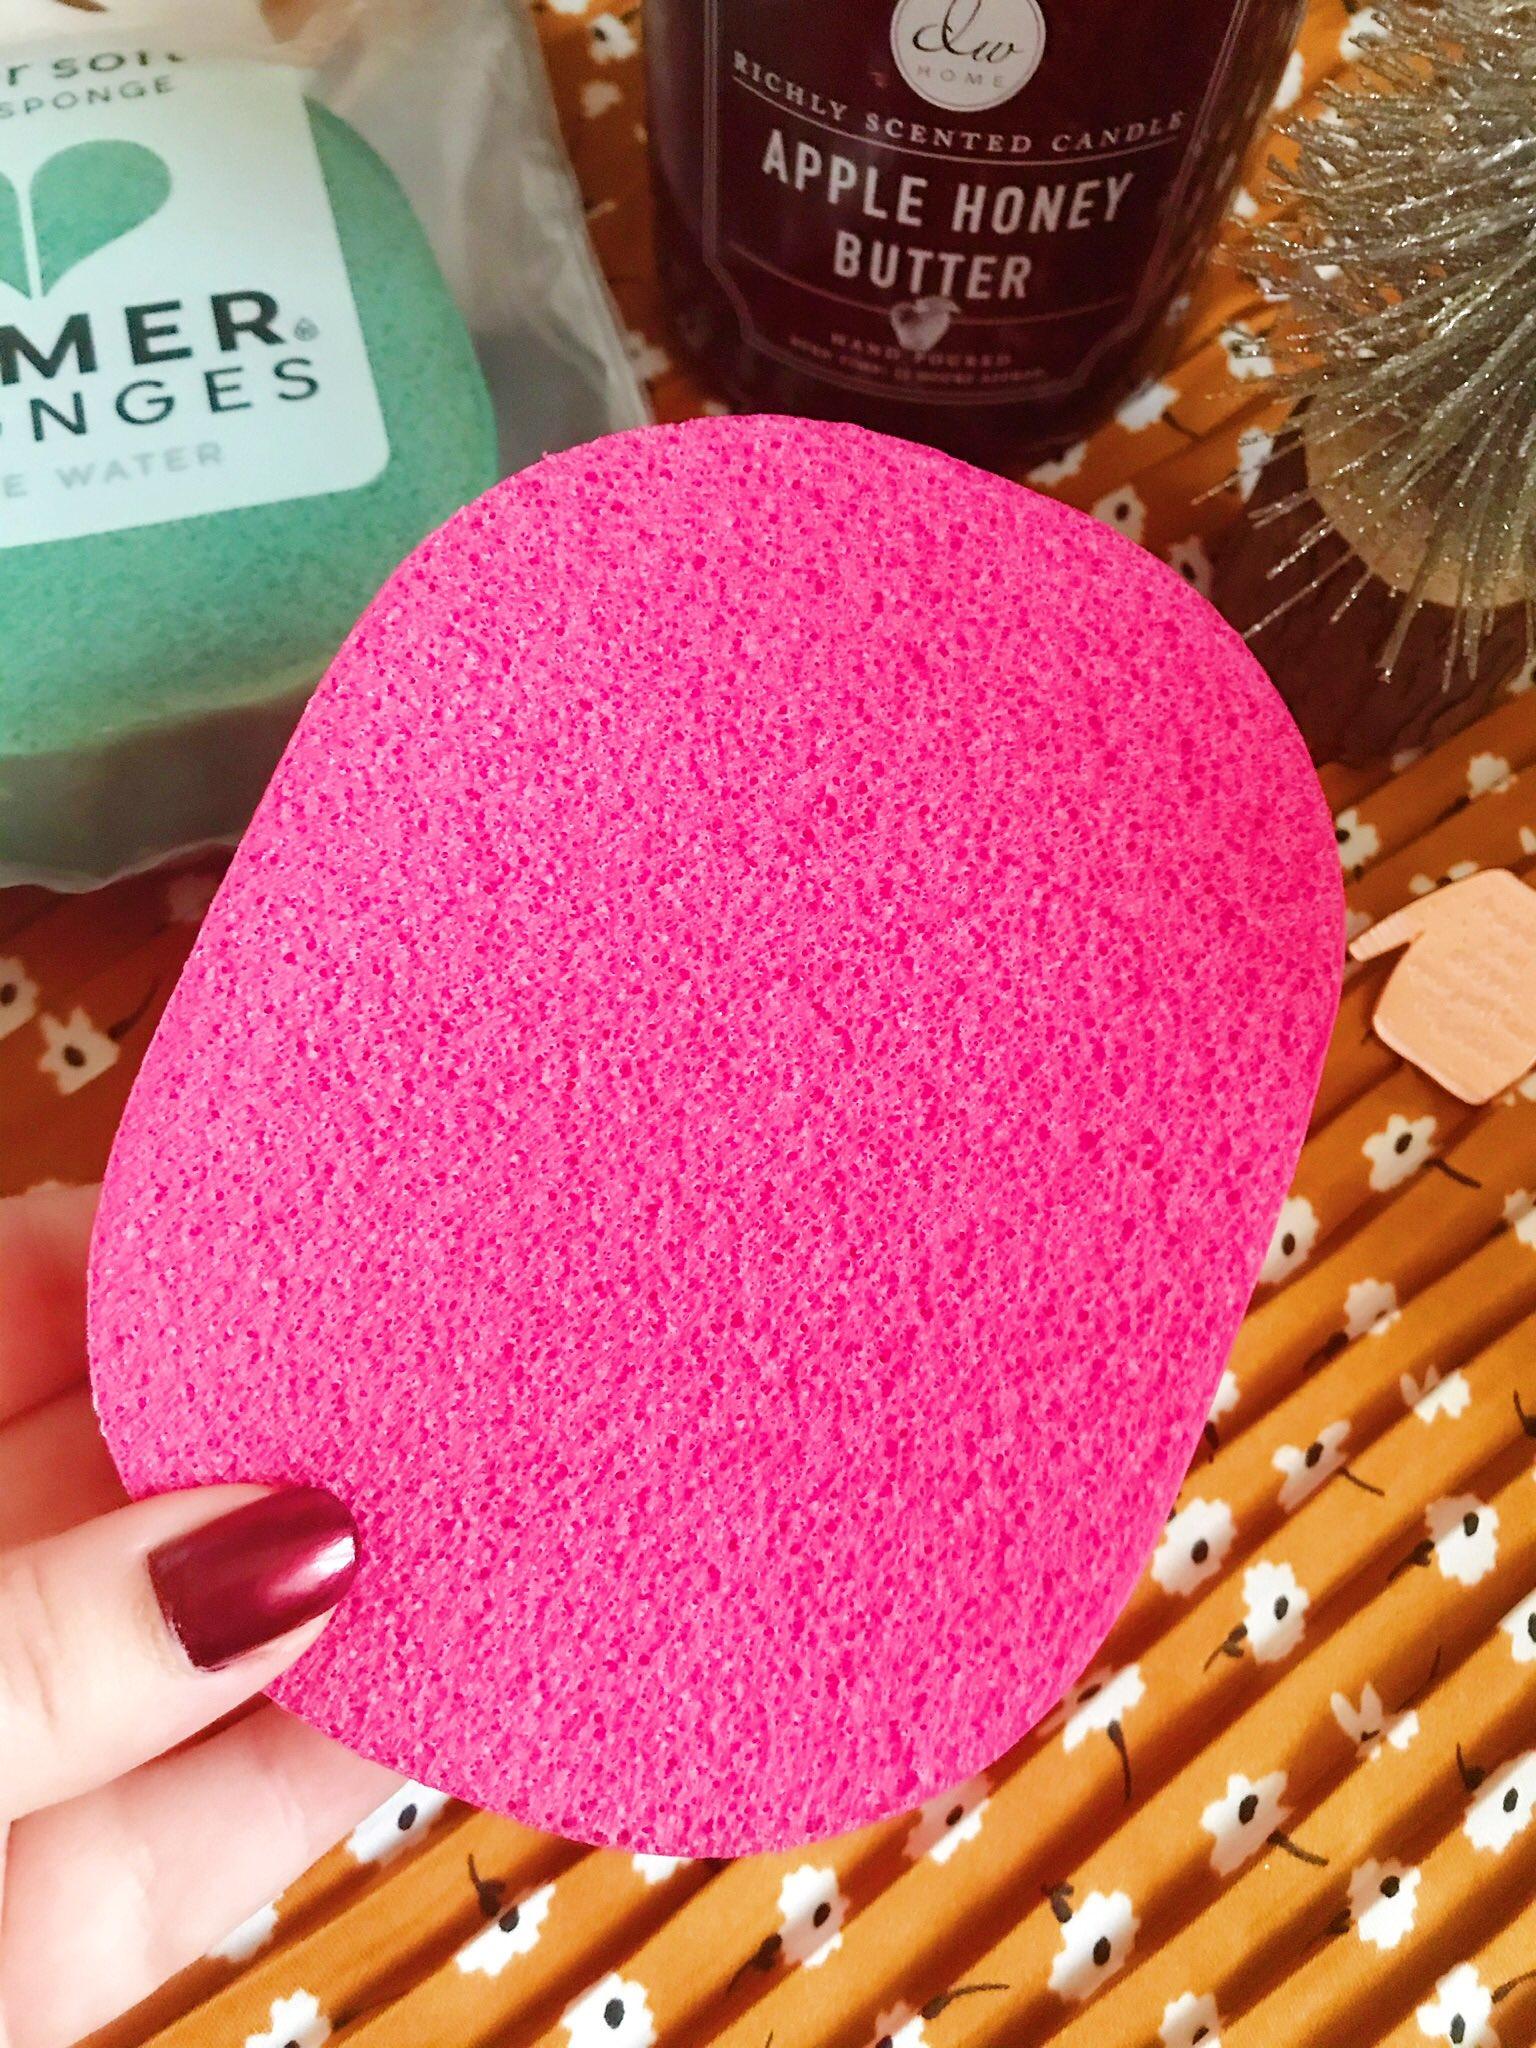 Closeup of pink Ramer sponge